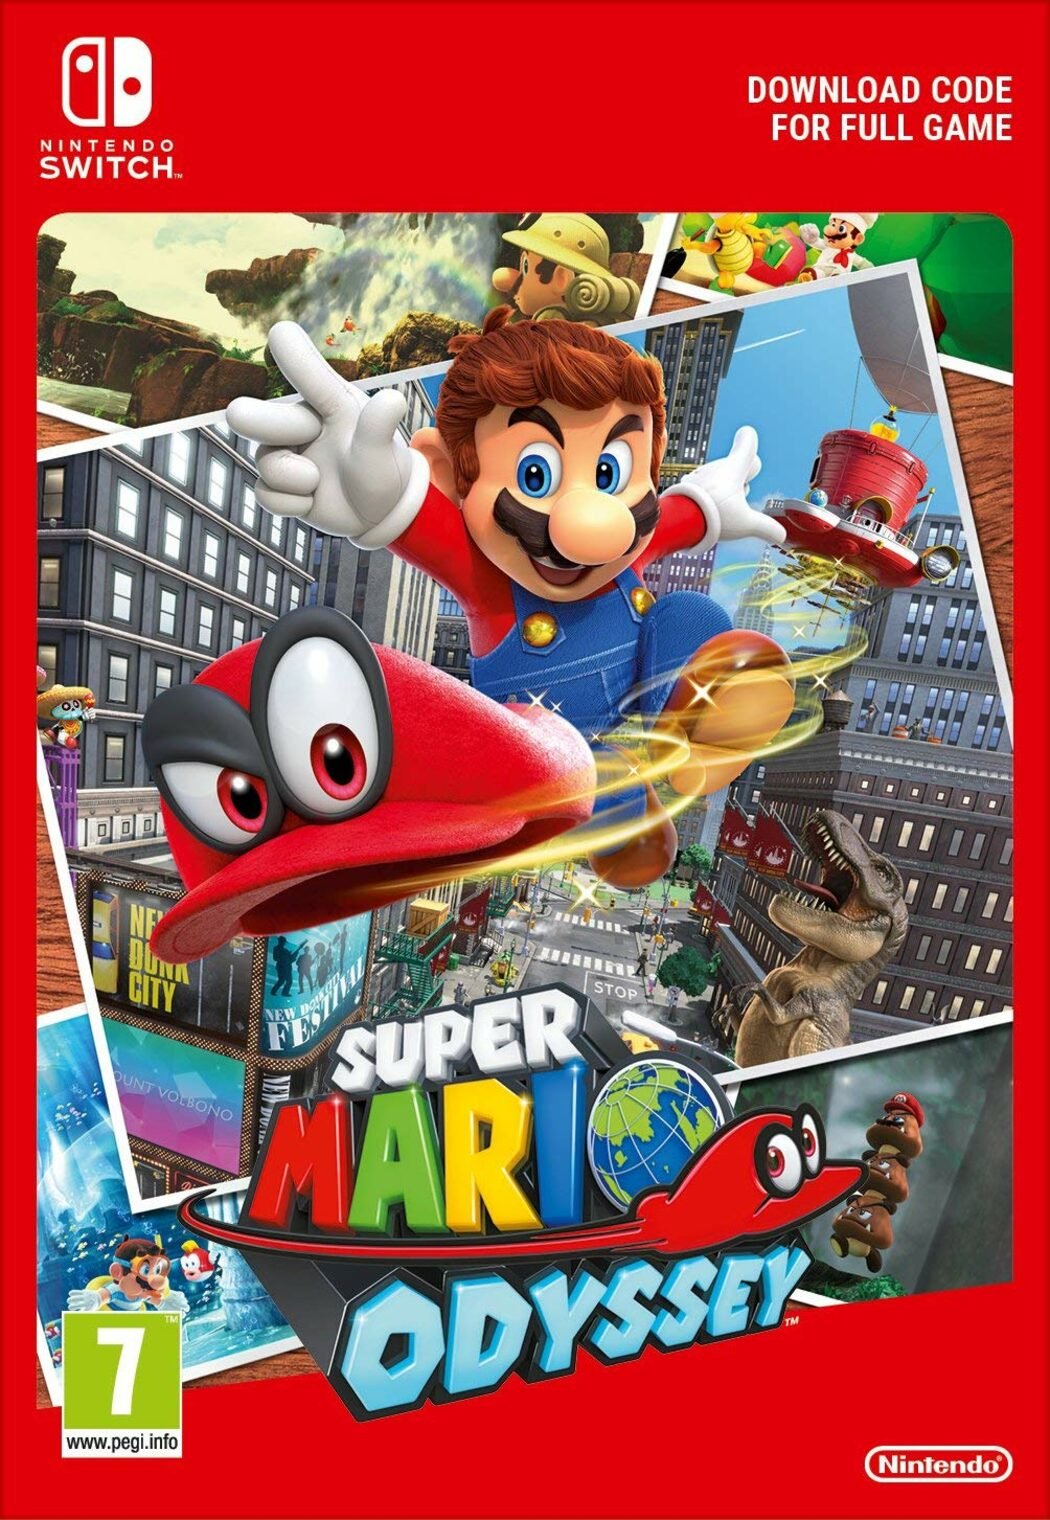 Buy Nintendo Switch Online 3 Month Key Cheaper Visit Eneba